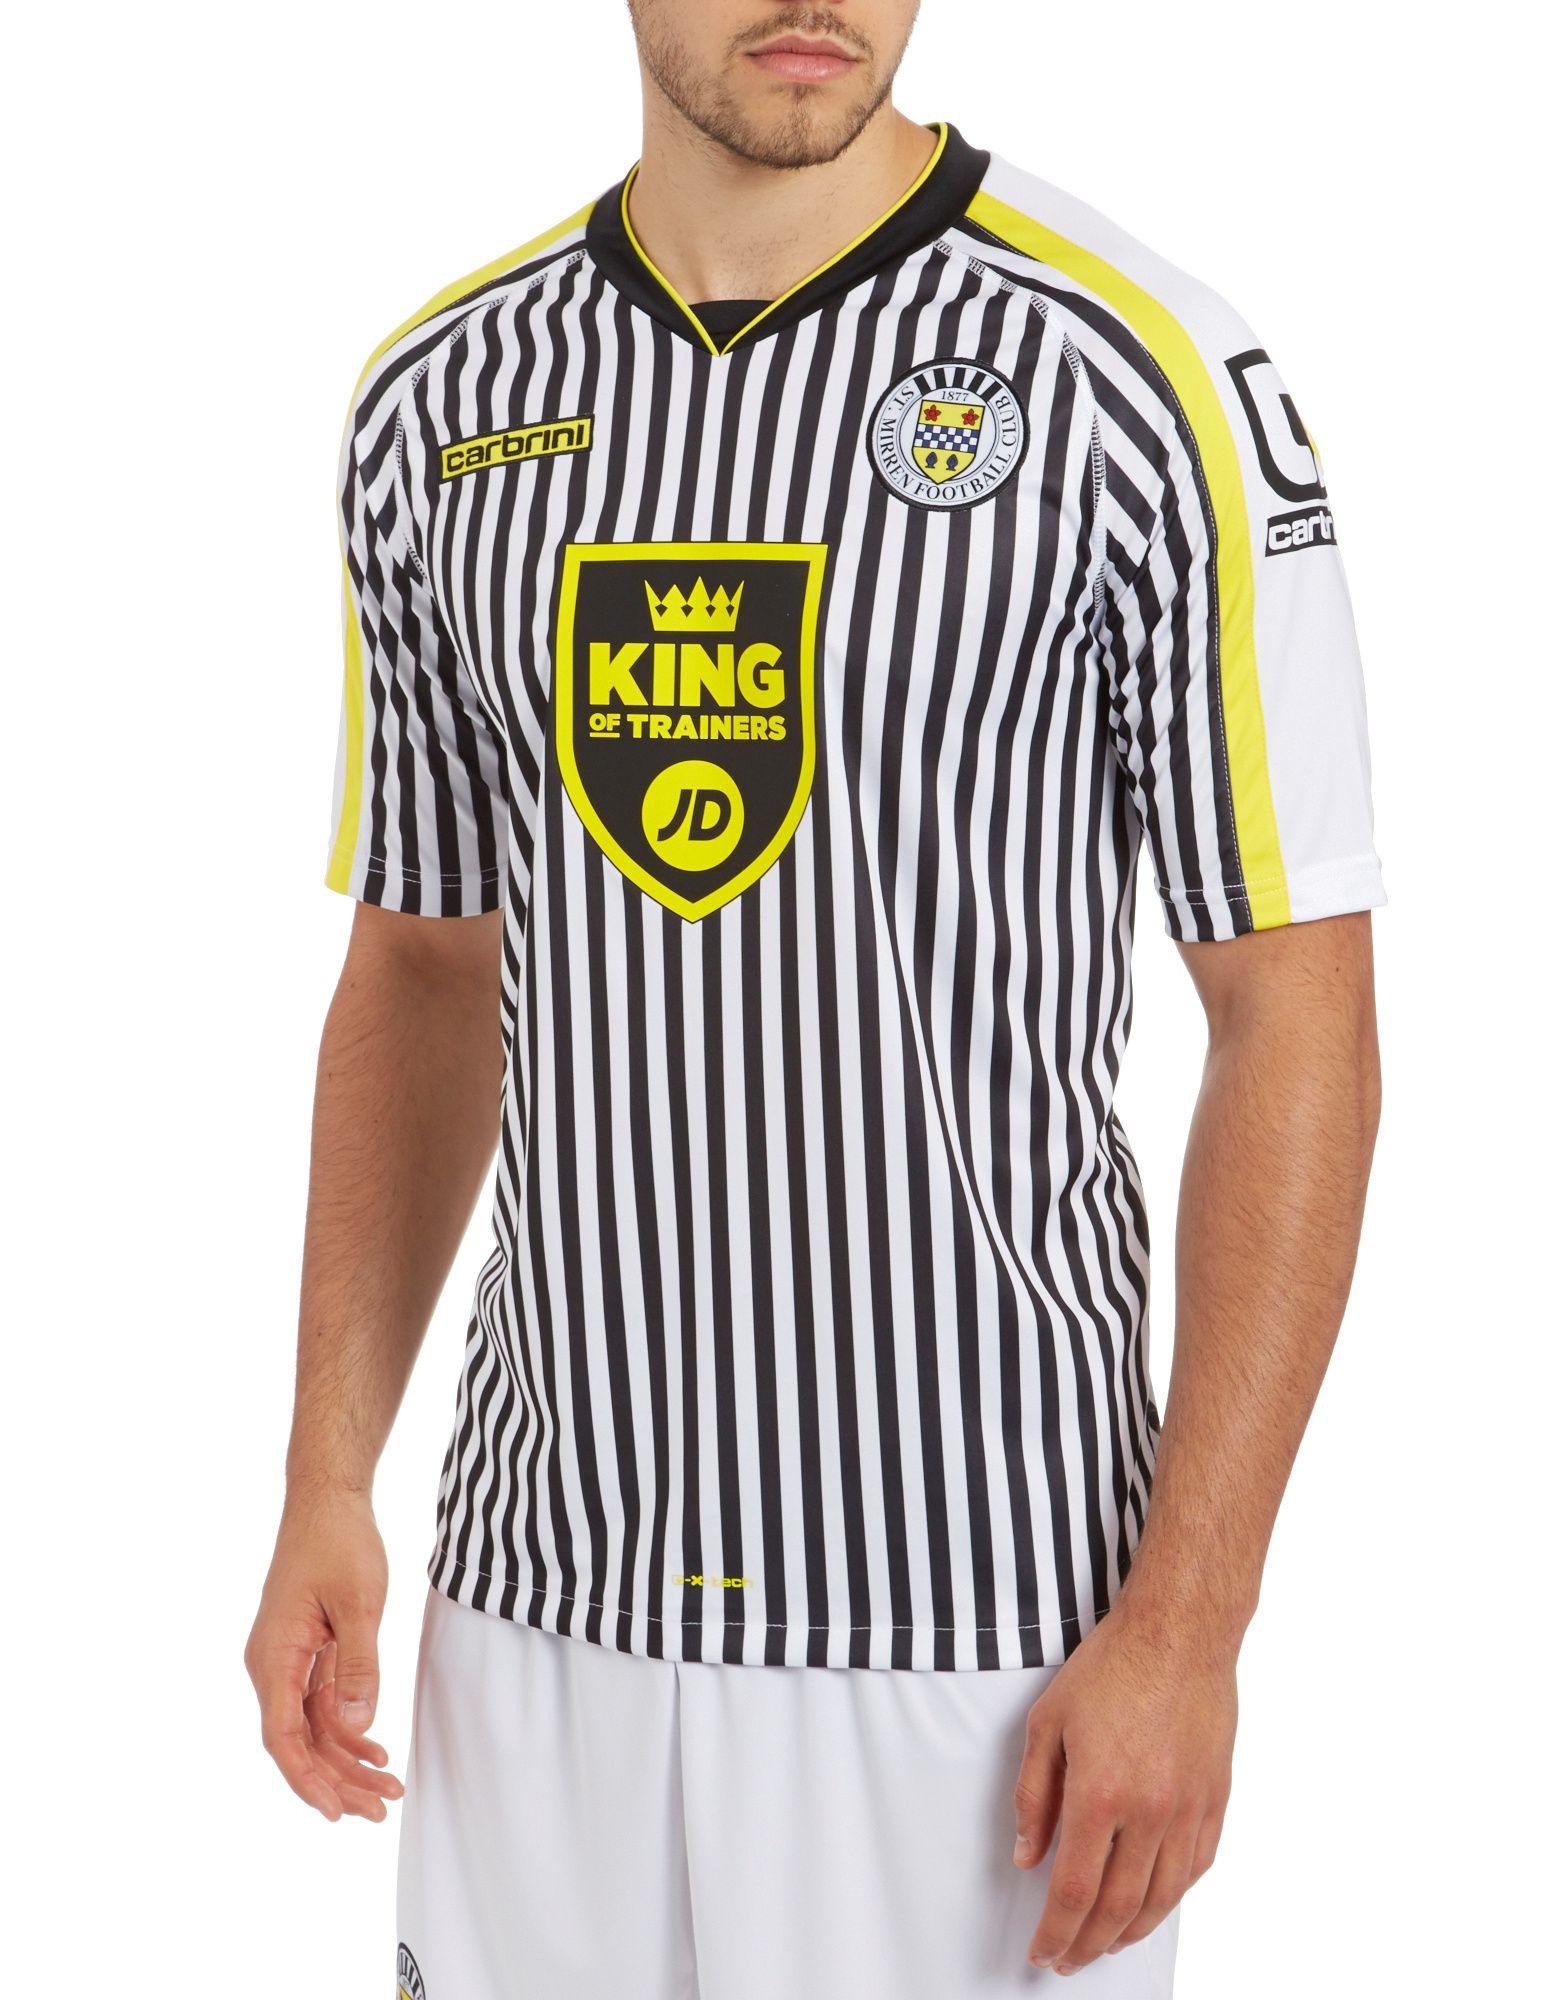 Carbrini ST Mirren 2014 Home Shirt